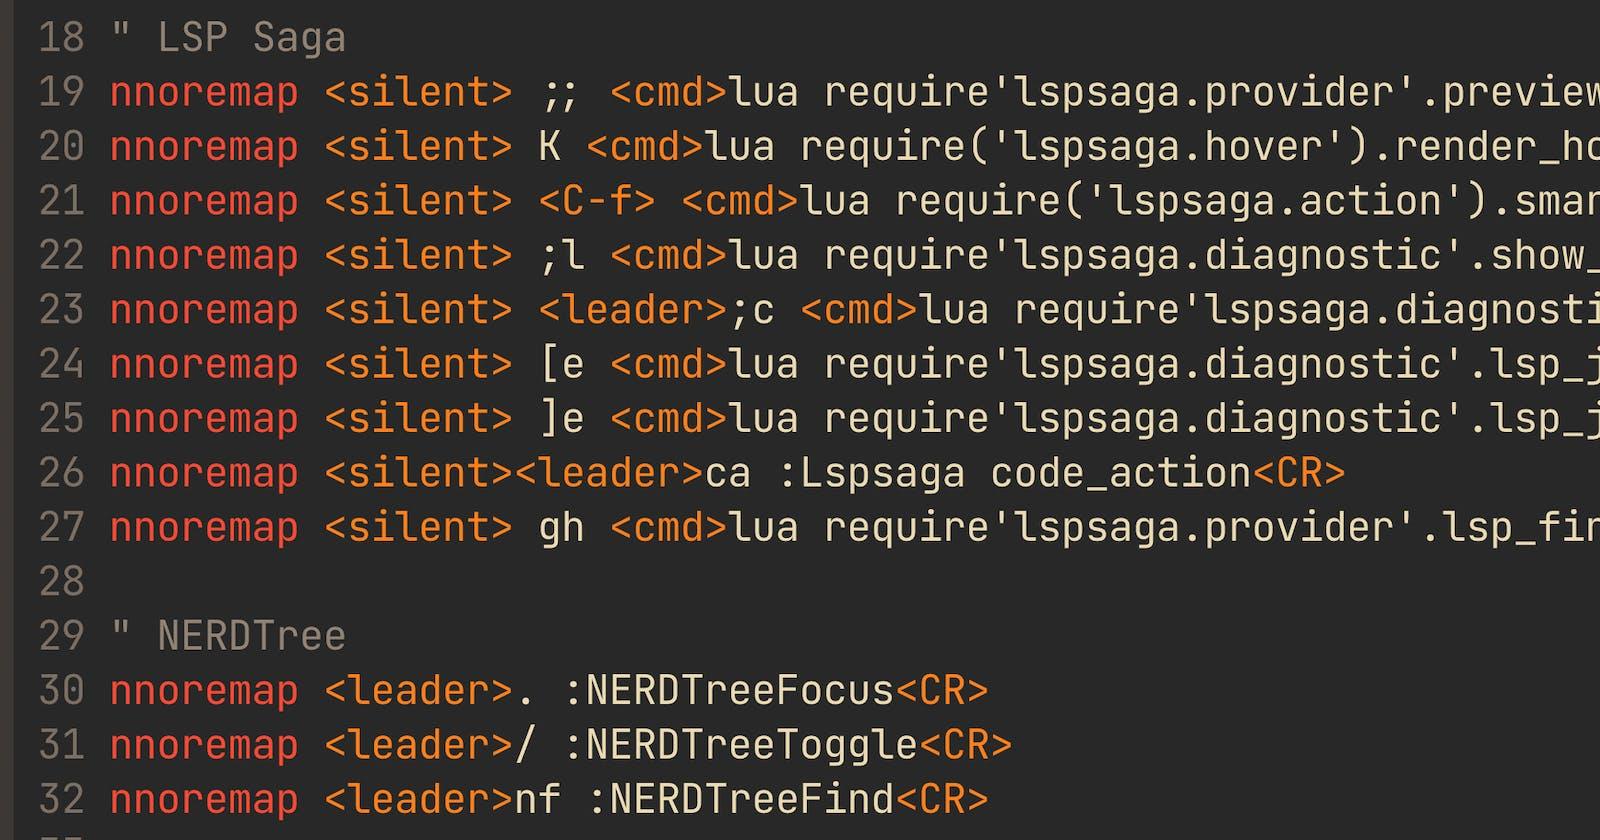 Neovim LSP commands, LSP Saga configuration and functionalities